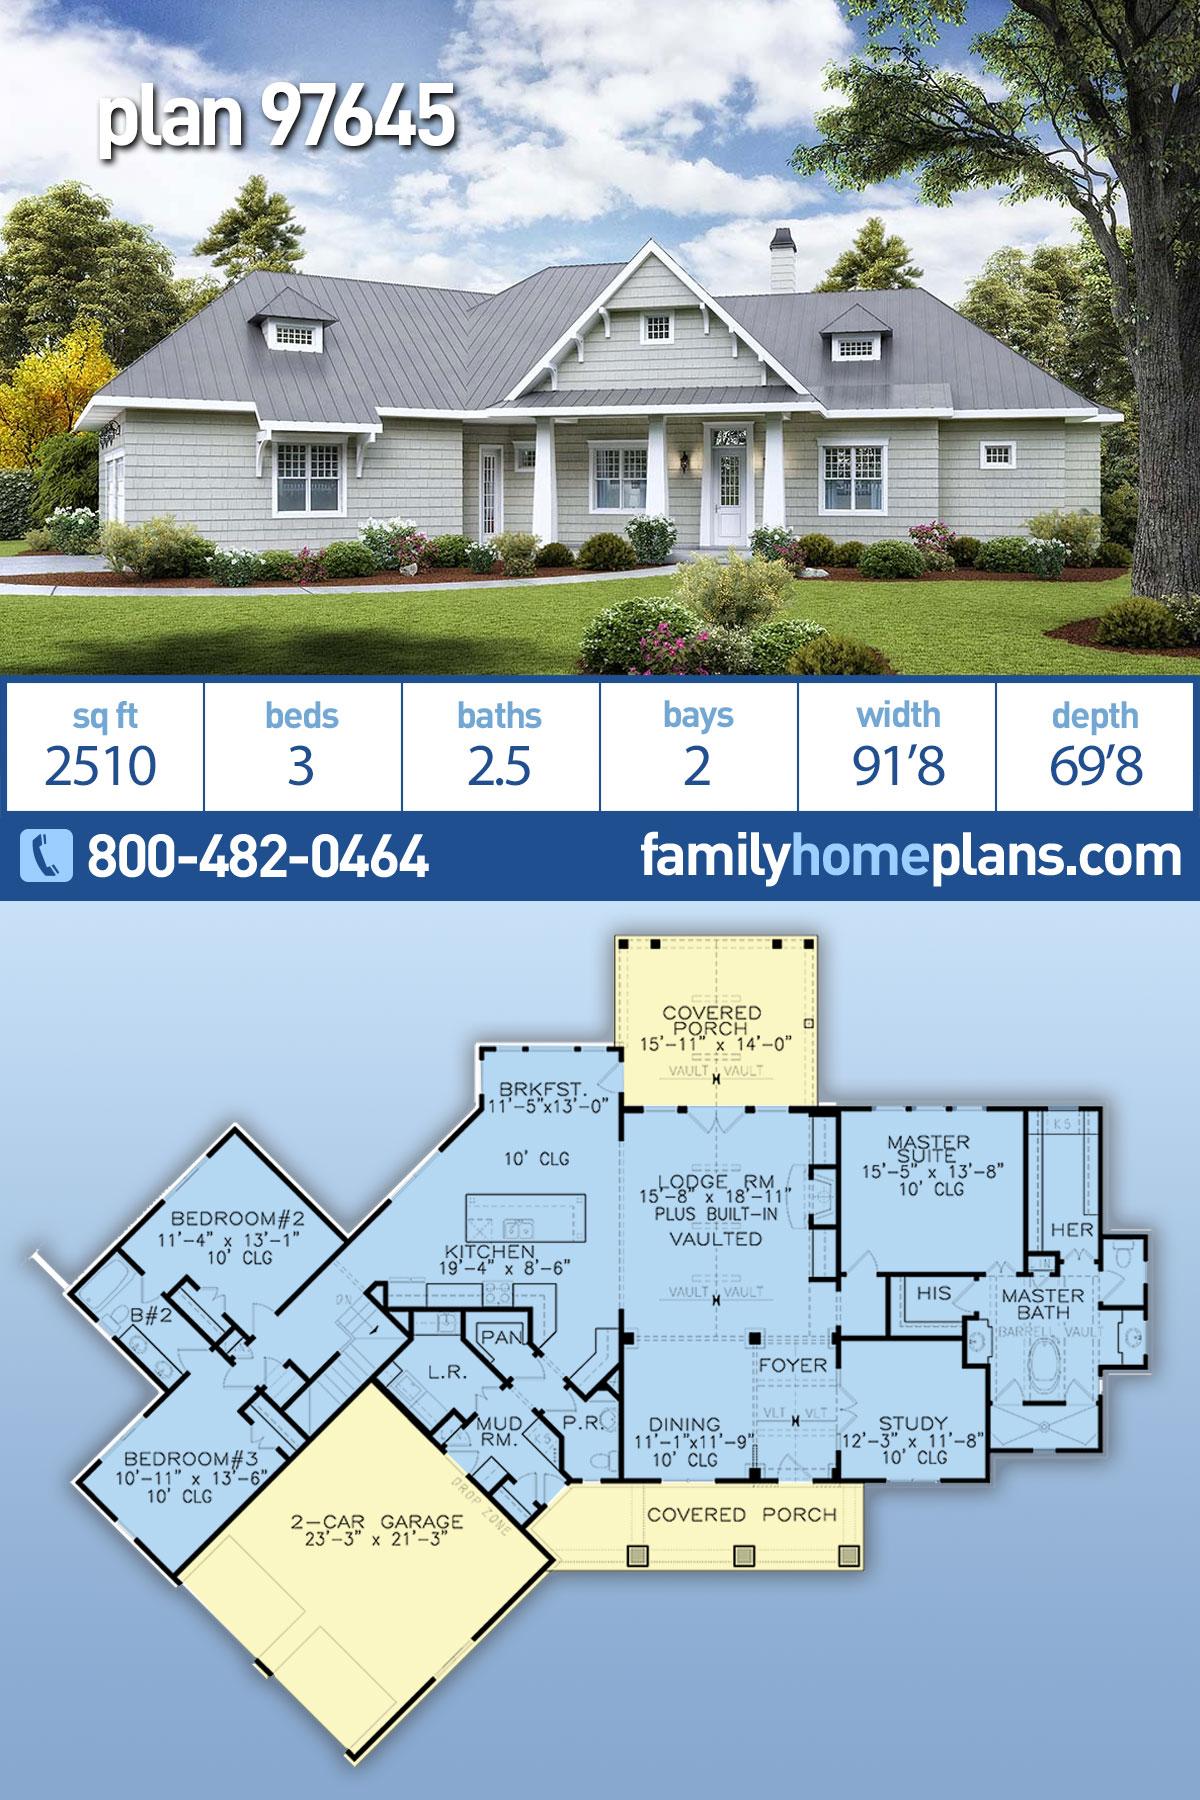 Coastal, Cottage, Craftsman House Plan 97645 with 3 Beds, 3 Baths, 2 Car Garage